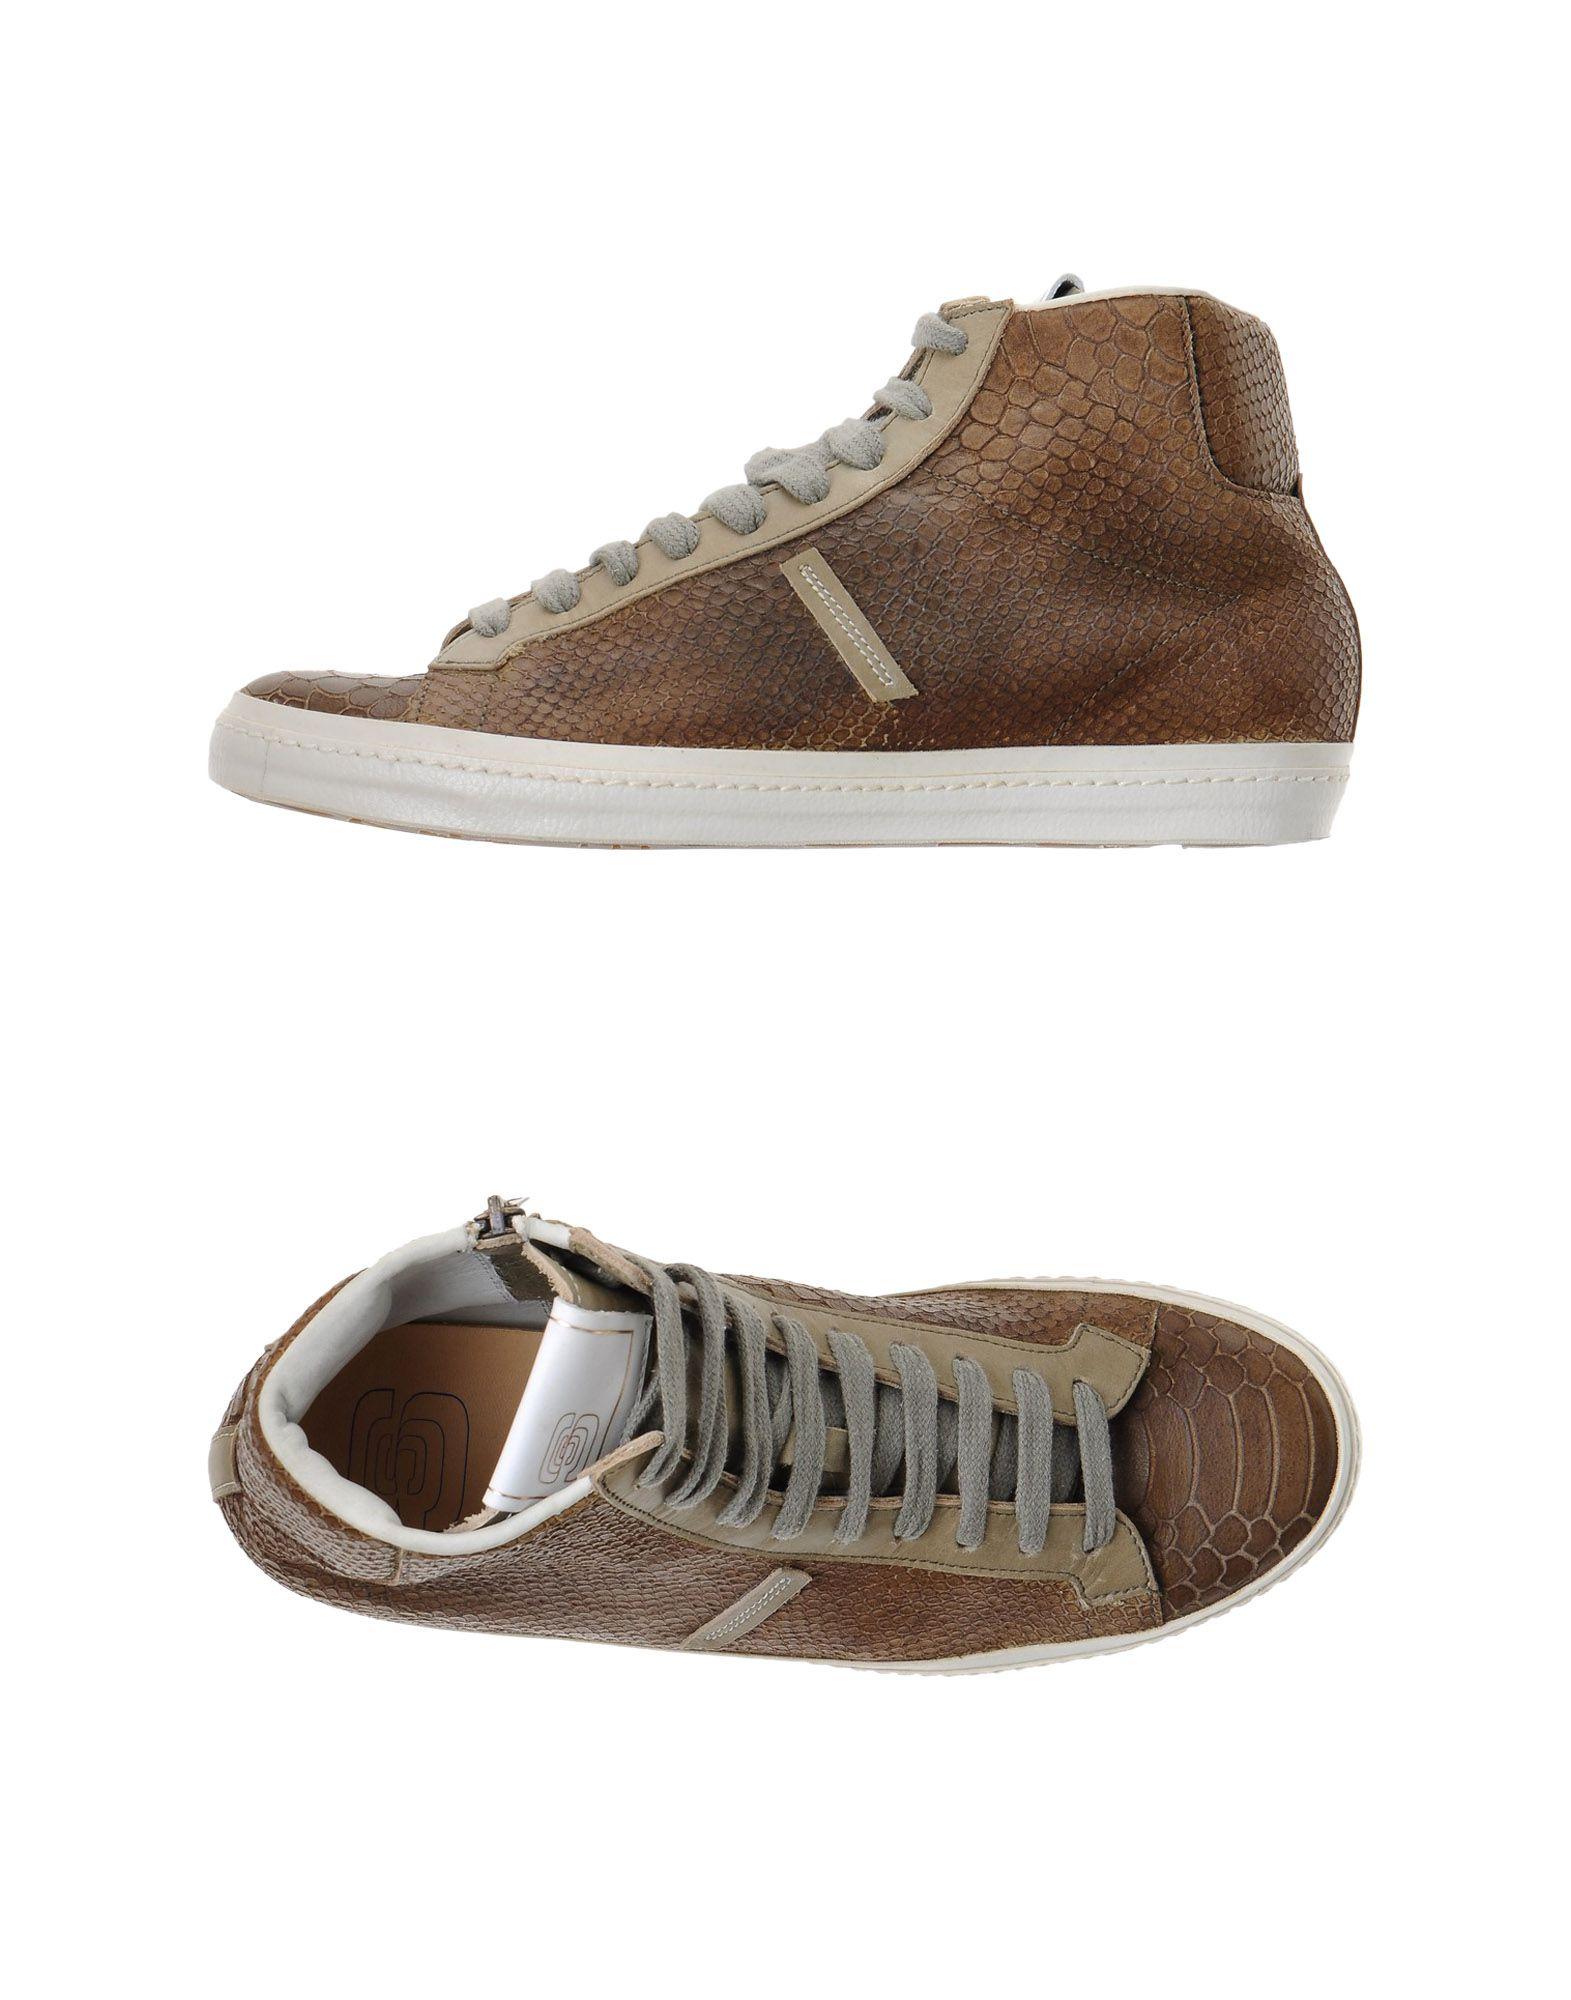 Esseutesse Sneakers Sneakers - Women Esseutesse Sneakers Esseutesse online on  Canada - 44845319XG 257a42